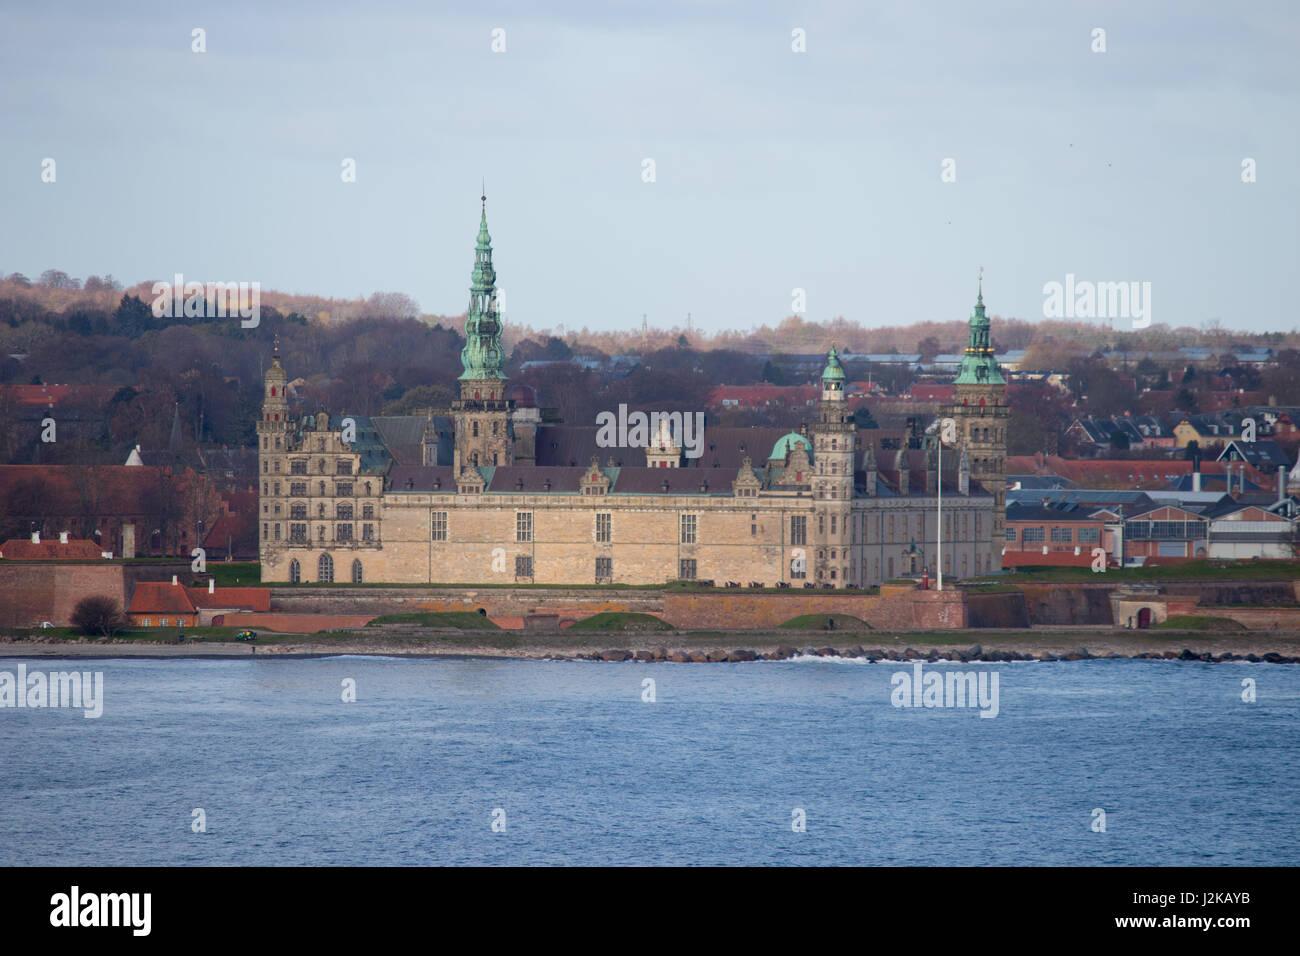 Kronborg castle in Helsingor, Denmark. Seen from the sea. - Stock Image